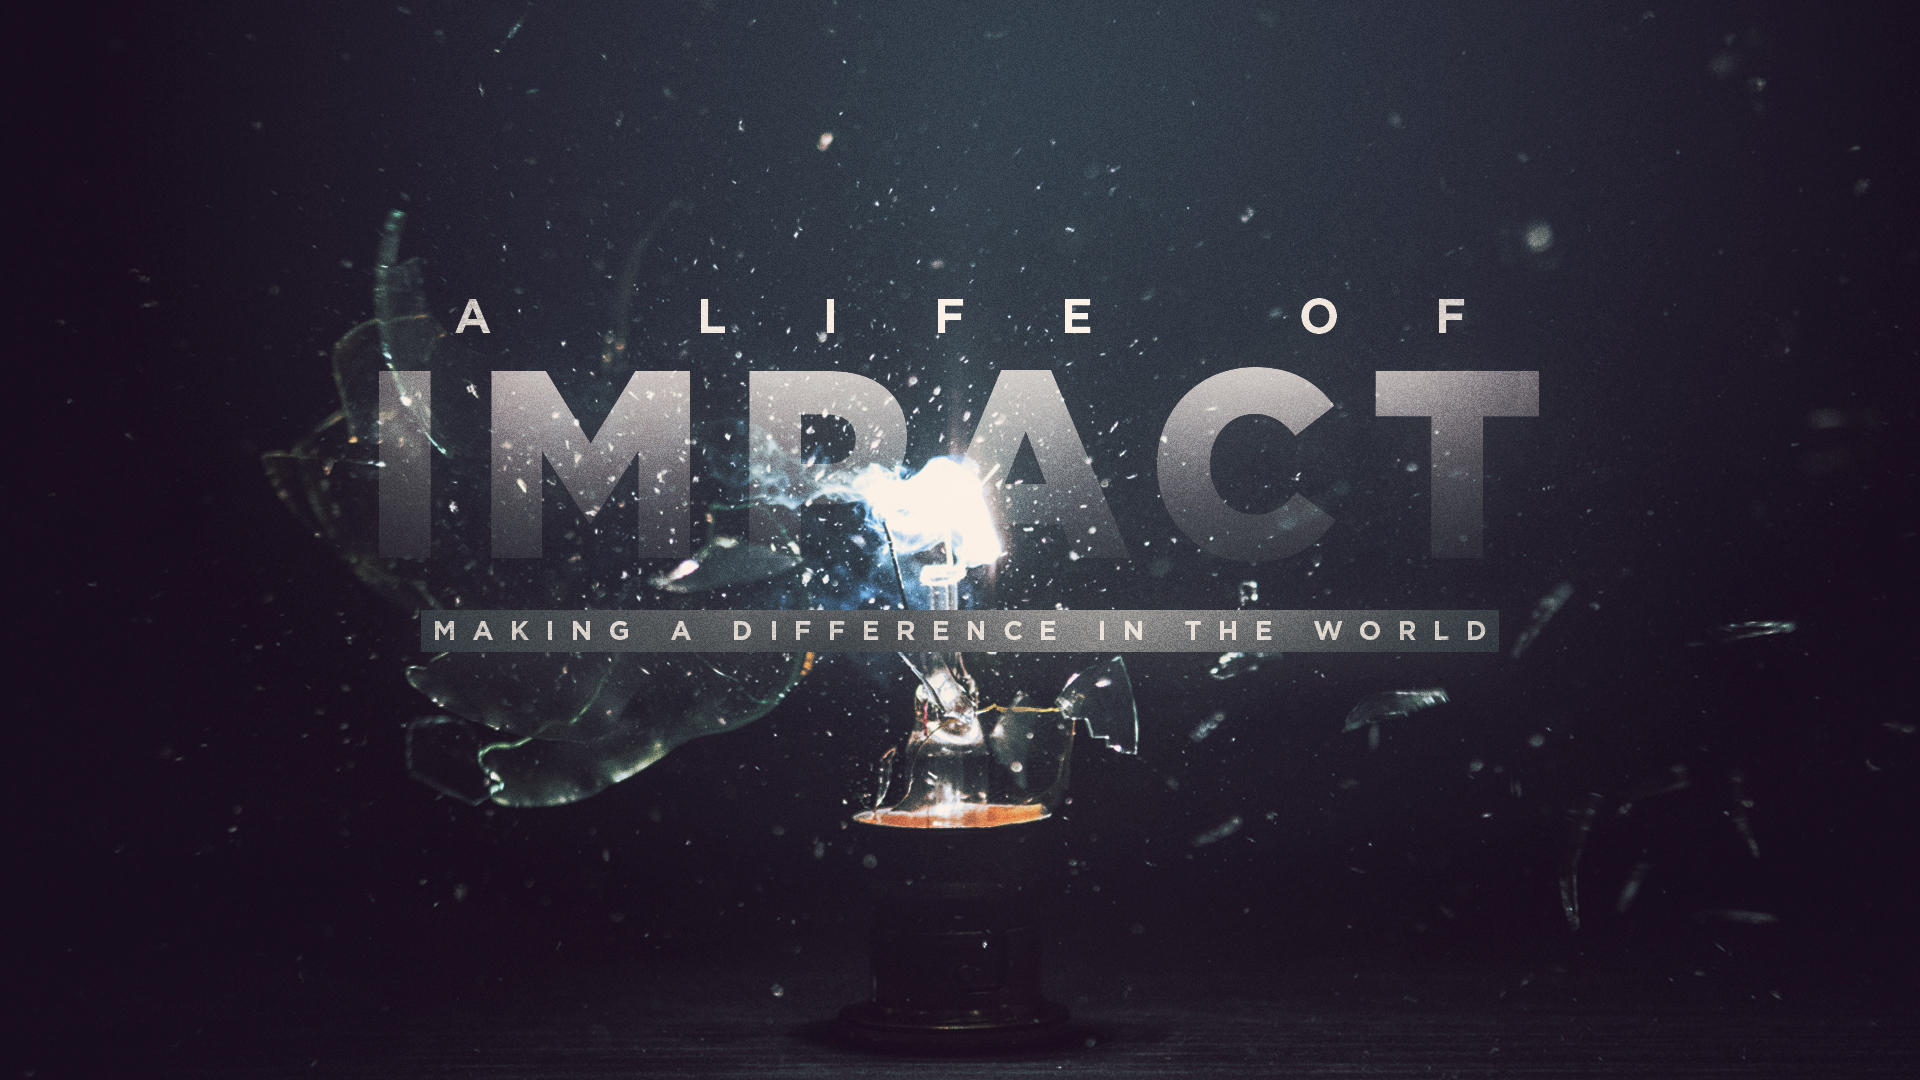 Al Life Of Impact Broken Glass-Subtitle.jpg